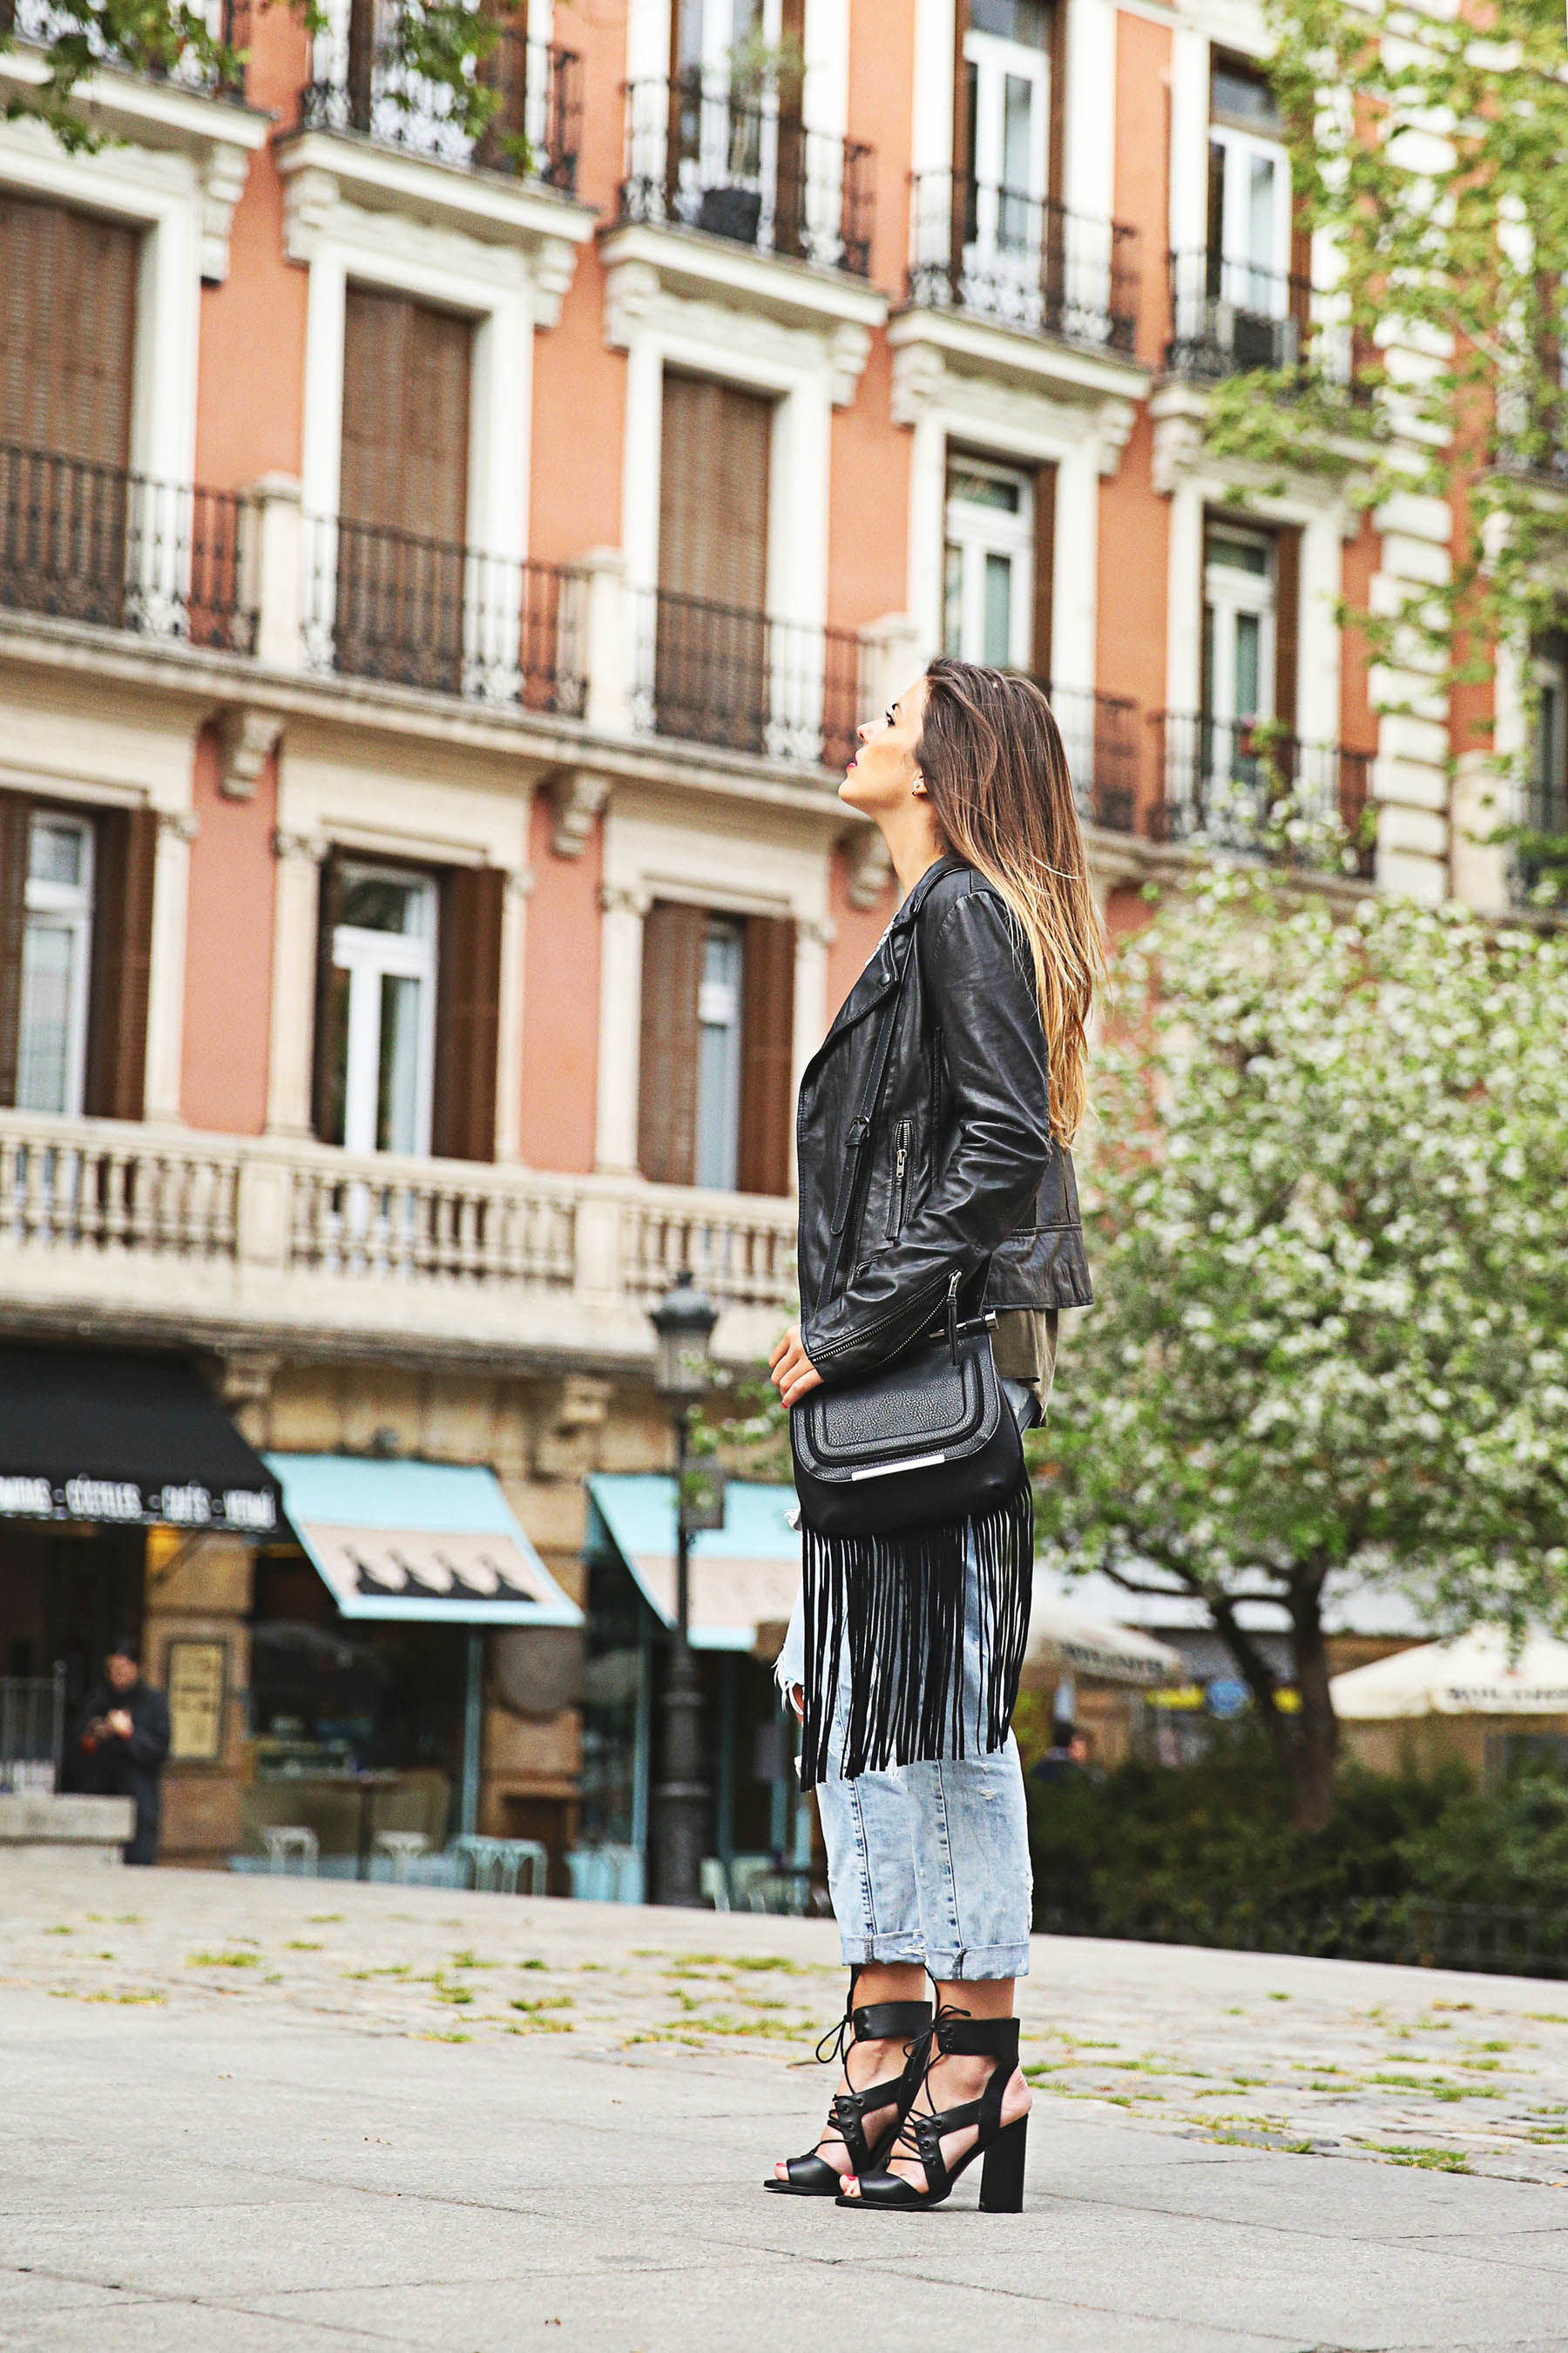 trendy-taste-look-outfit-street-style-ootd-blog-blogger-fashion-spain-moda-españa-boyfriend-vaqueros-jeans-steve-madden-sandalias-verano-primavera-leather-jacket-chaqueta-cuero-khaki-caqui-ripped-rotos-3